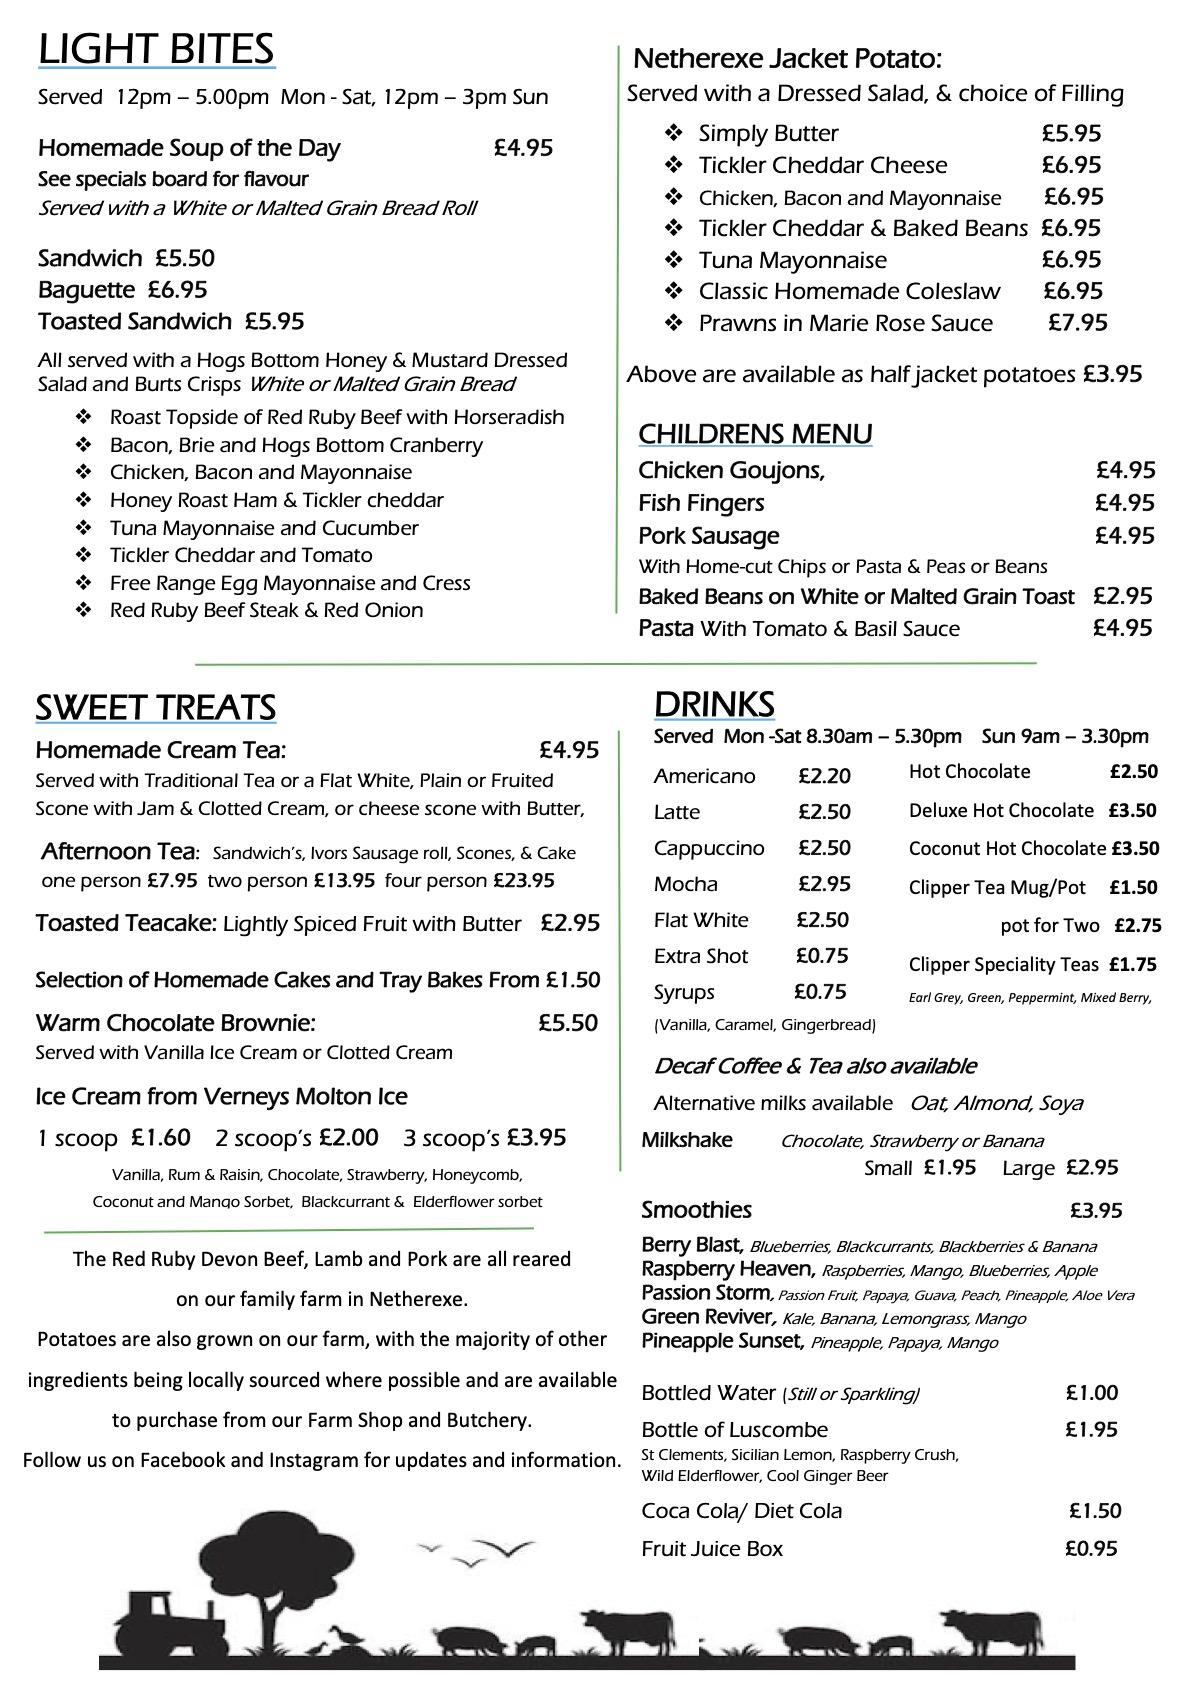 Spring 2021 menu